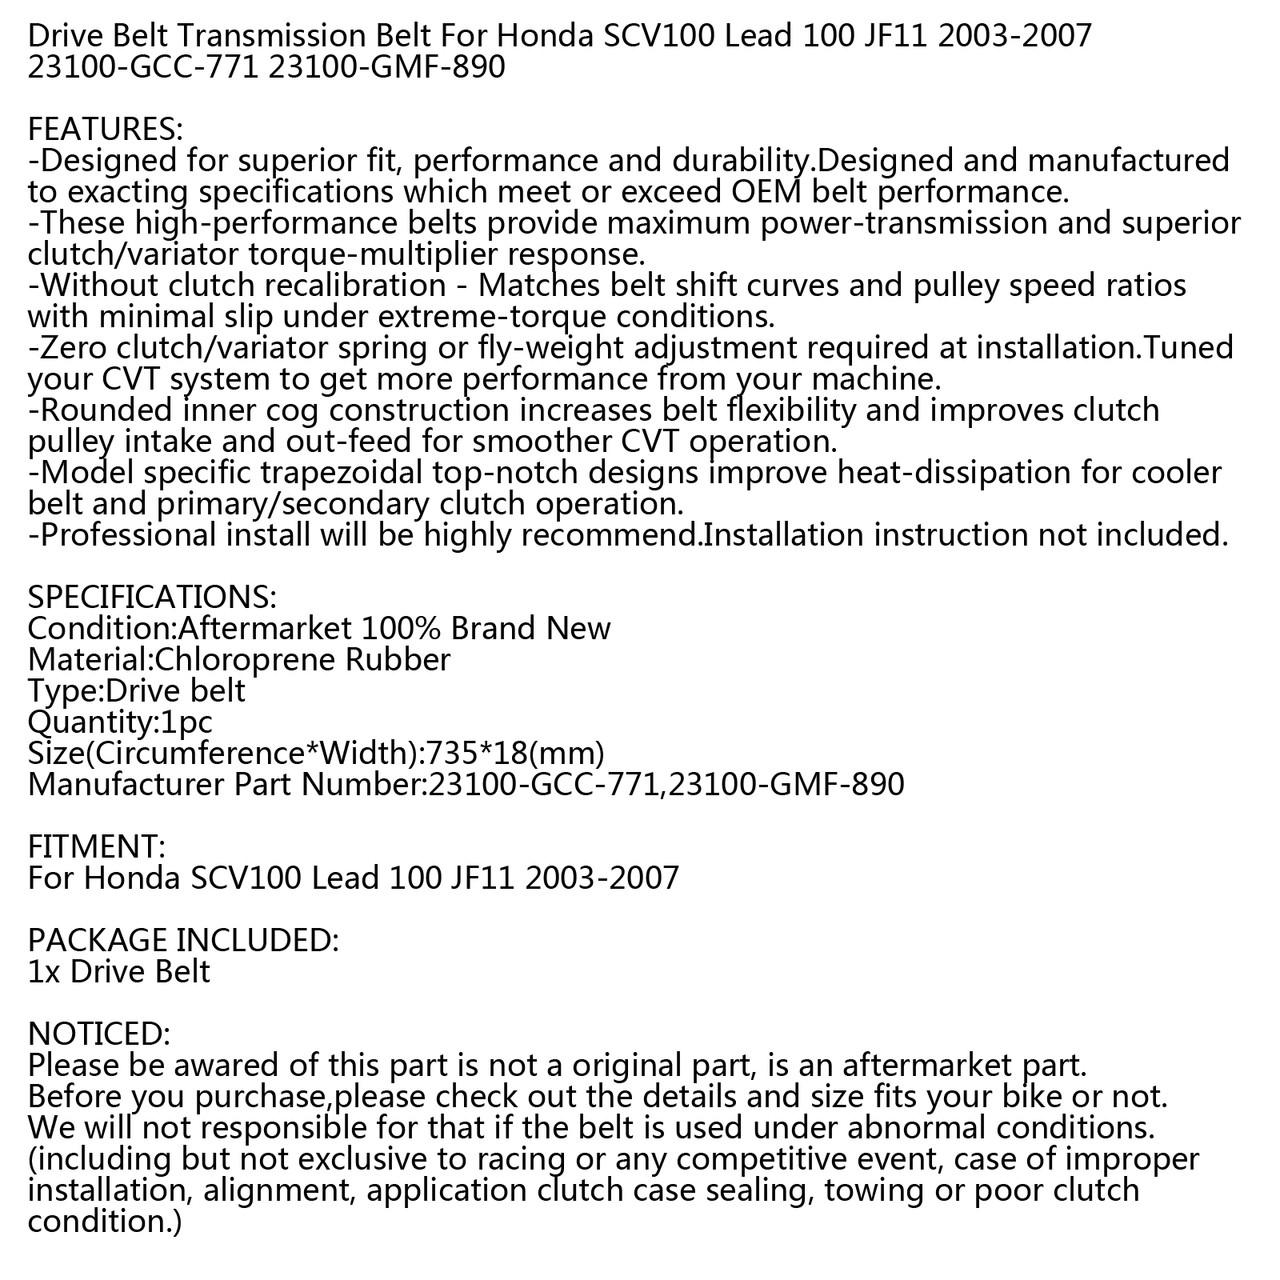 Drive Belt For Honda SCV100 Lead 100 JF11 2003-2007